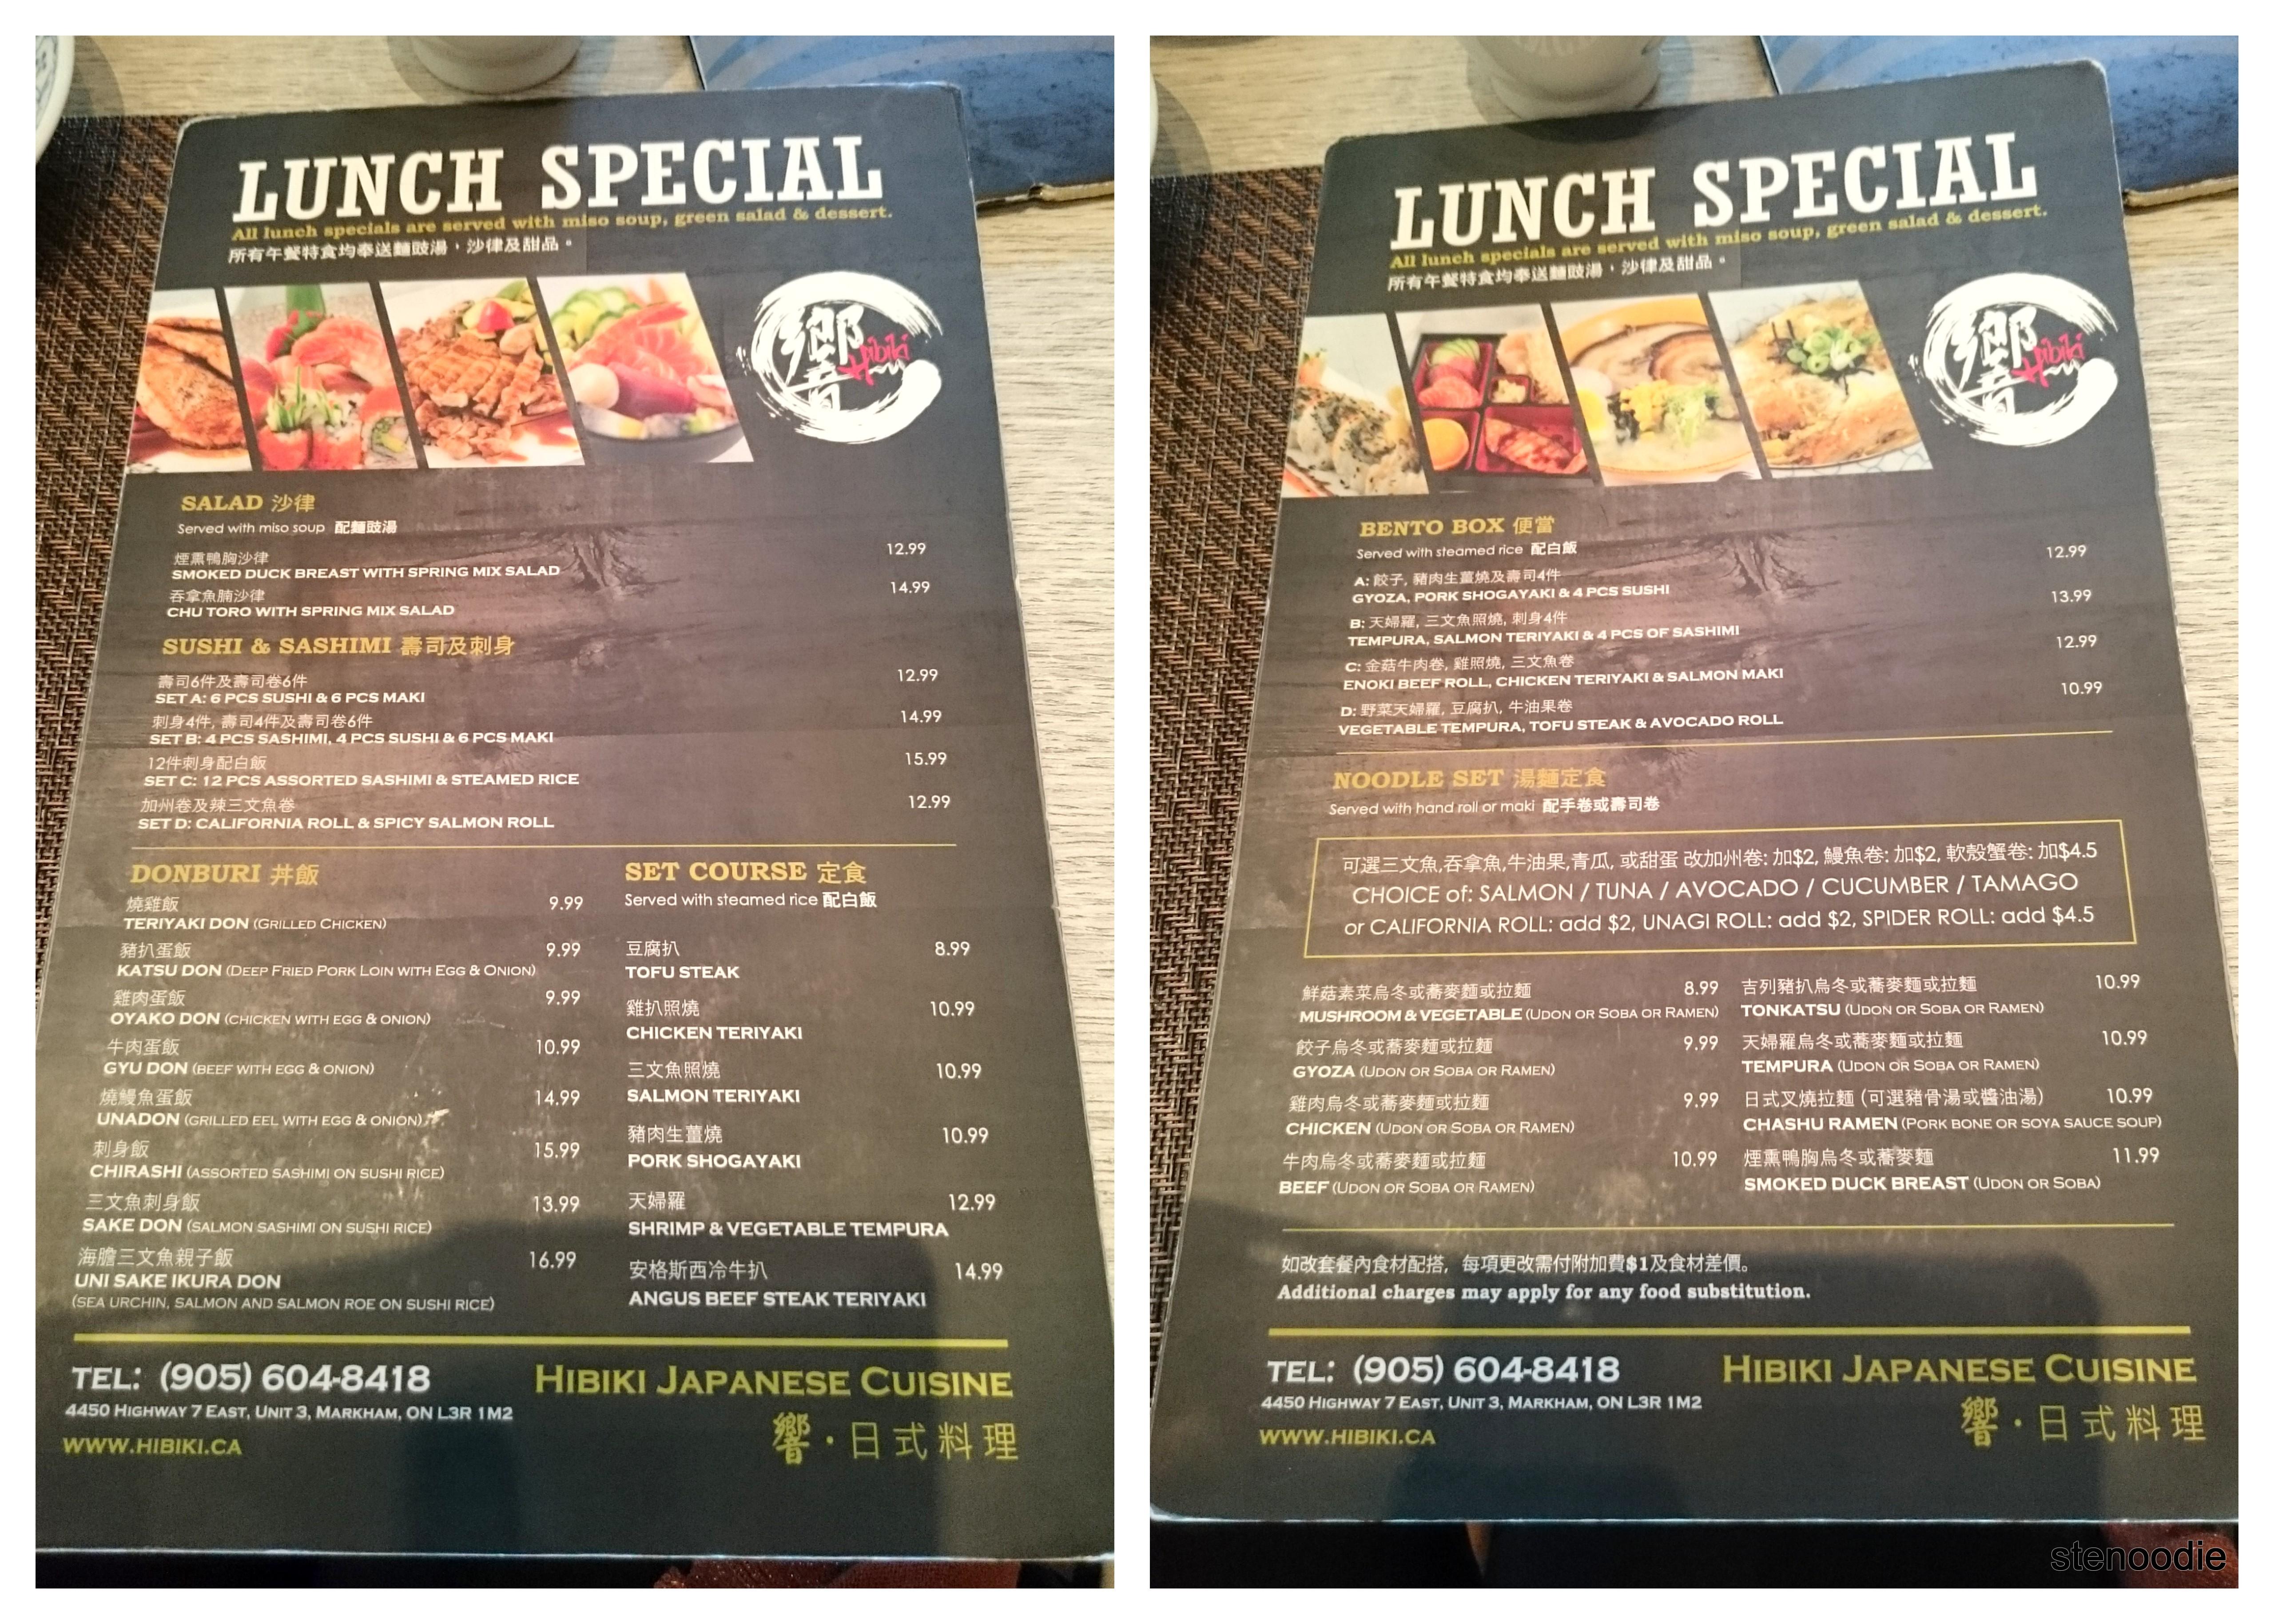 Hibiki Japanese Cuisine Lunch Special menu